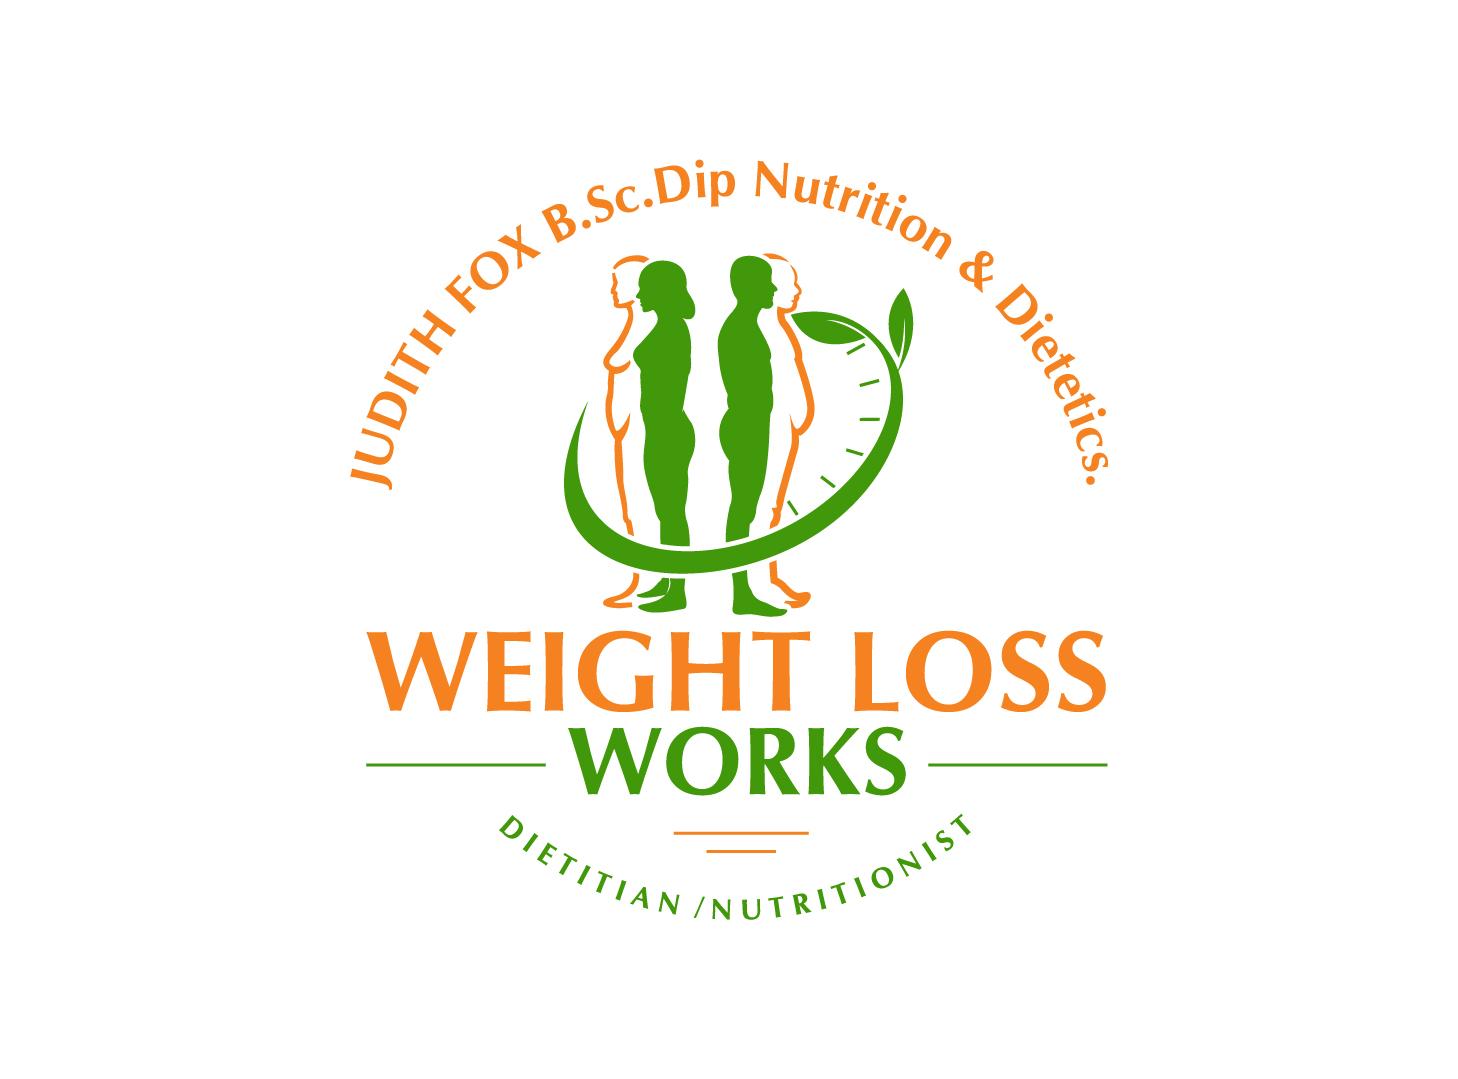 logo design for weight loss works judith fox b sc dip nutrition